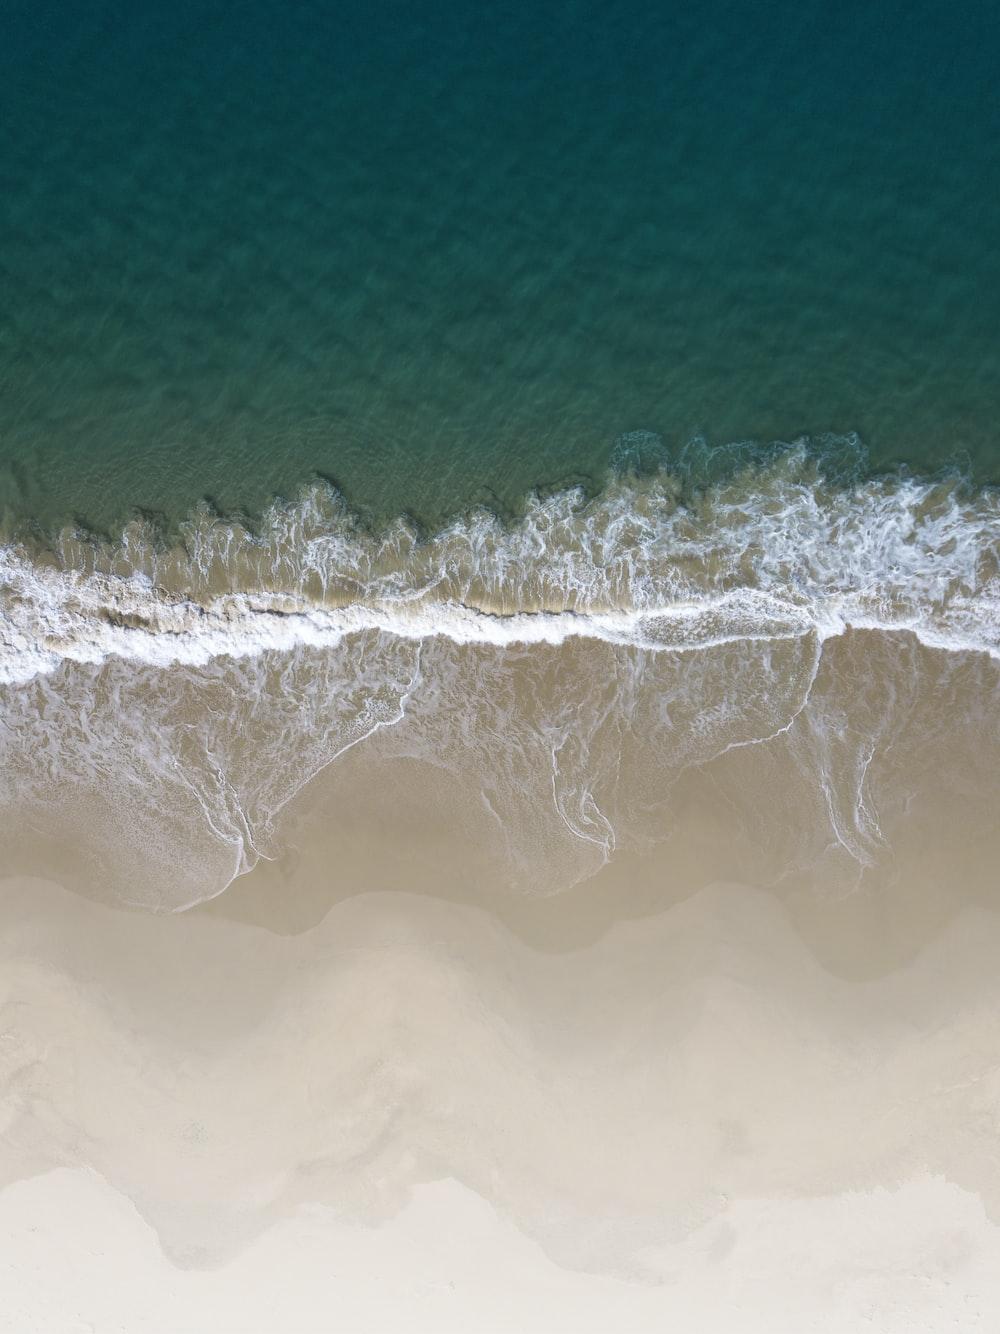 brown sand next to beach